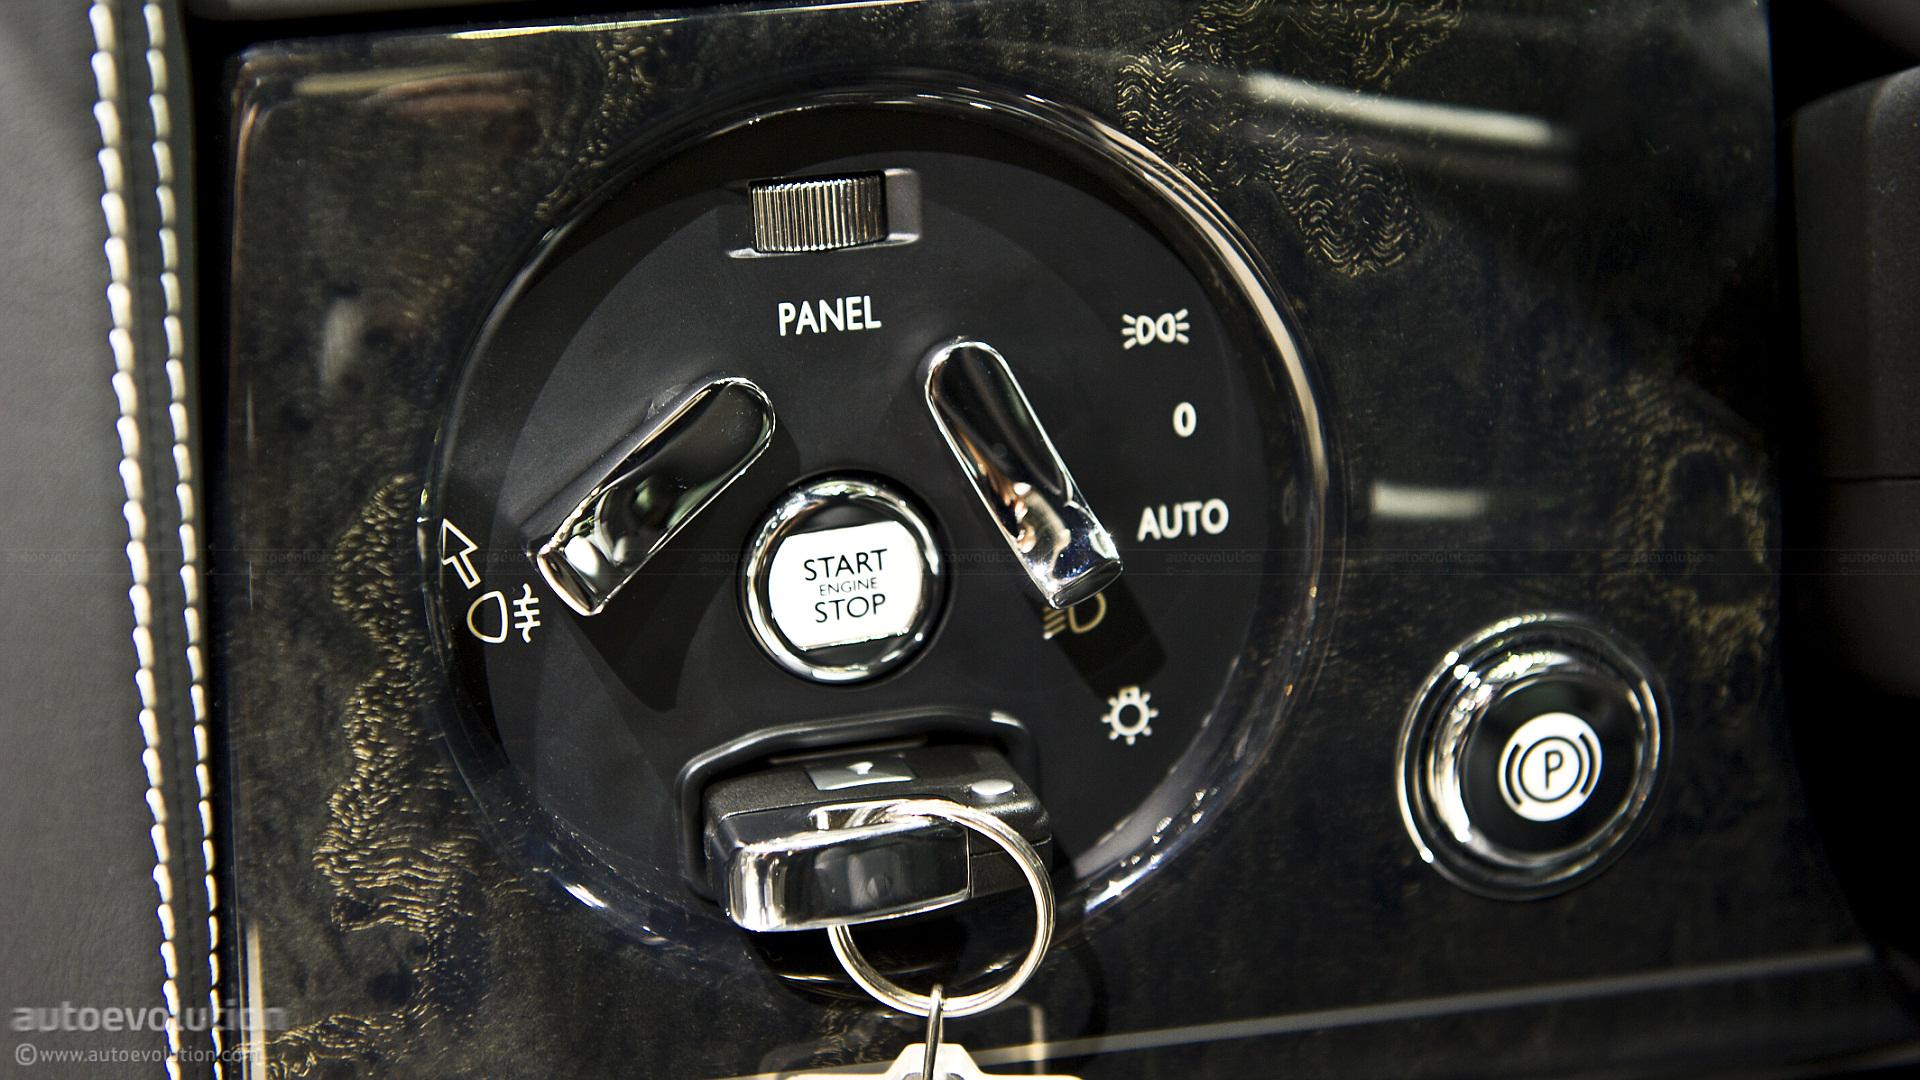 Geneva 2012 Rolls Royce Phantom Facelift Live Photos Autoevolution